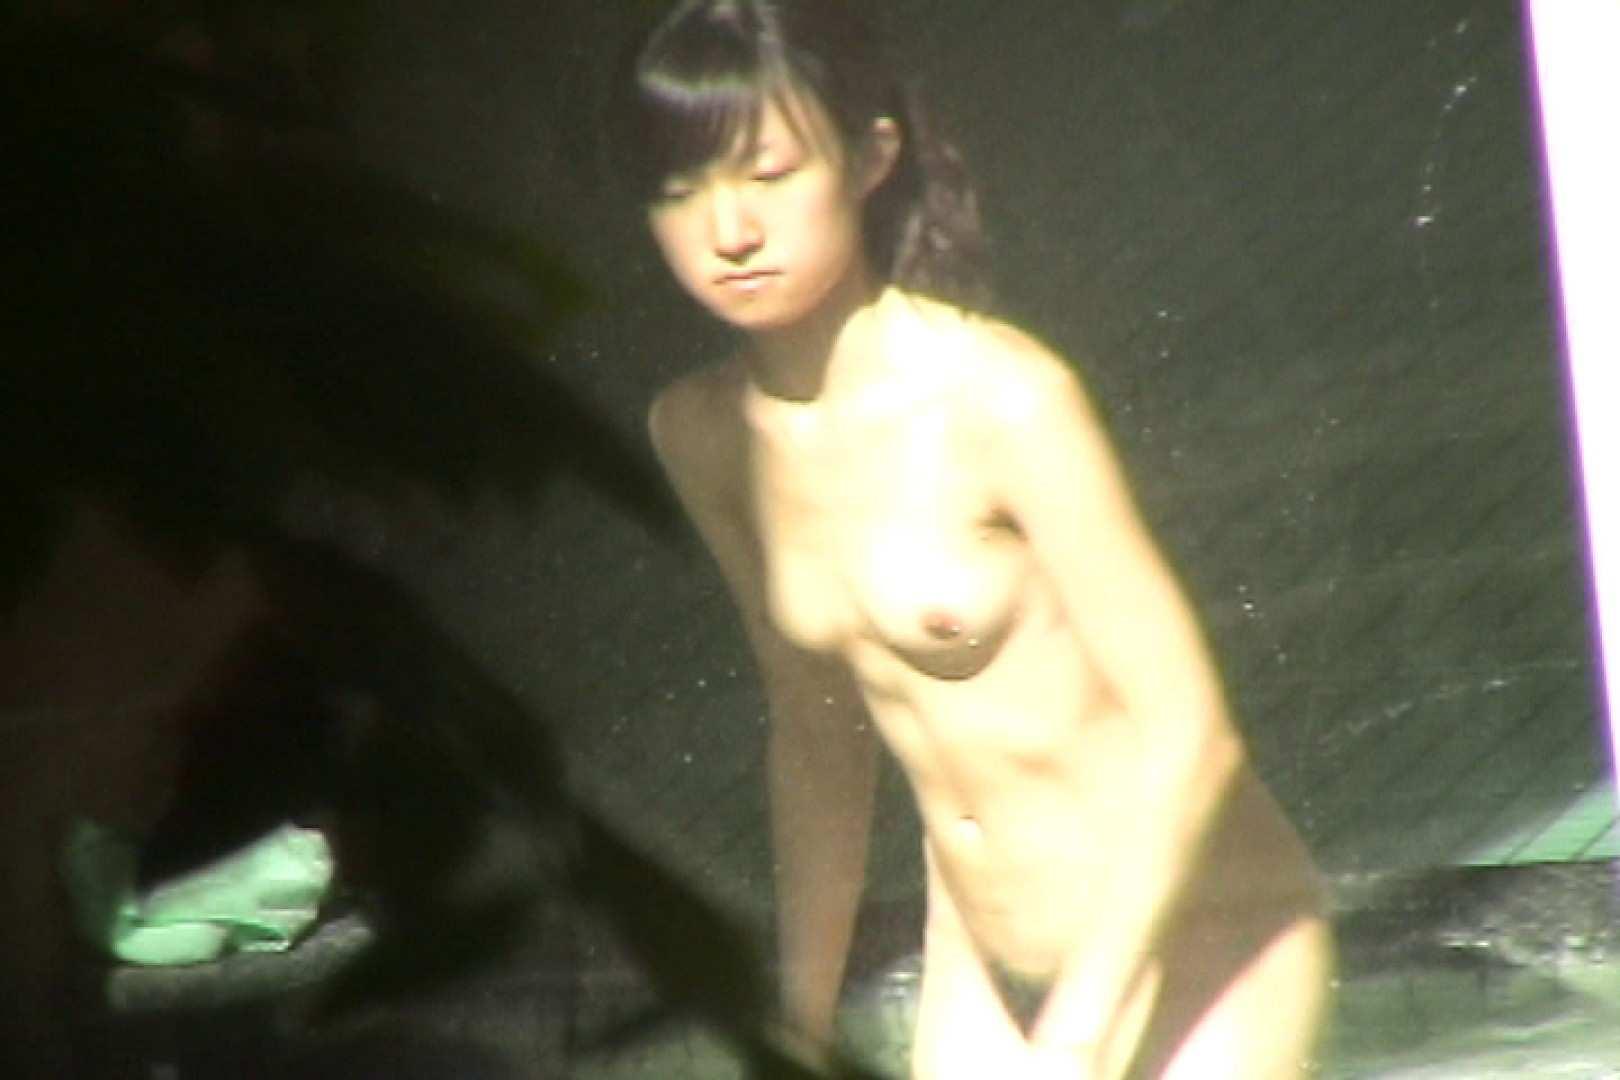 Aquaな露天風呂Vol.704 盗撮 AV無料動画キャプチャ 38連発 14